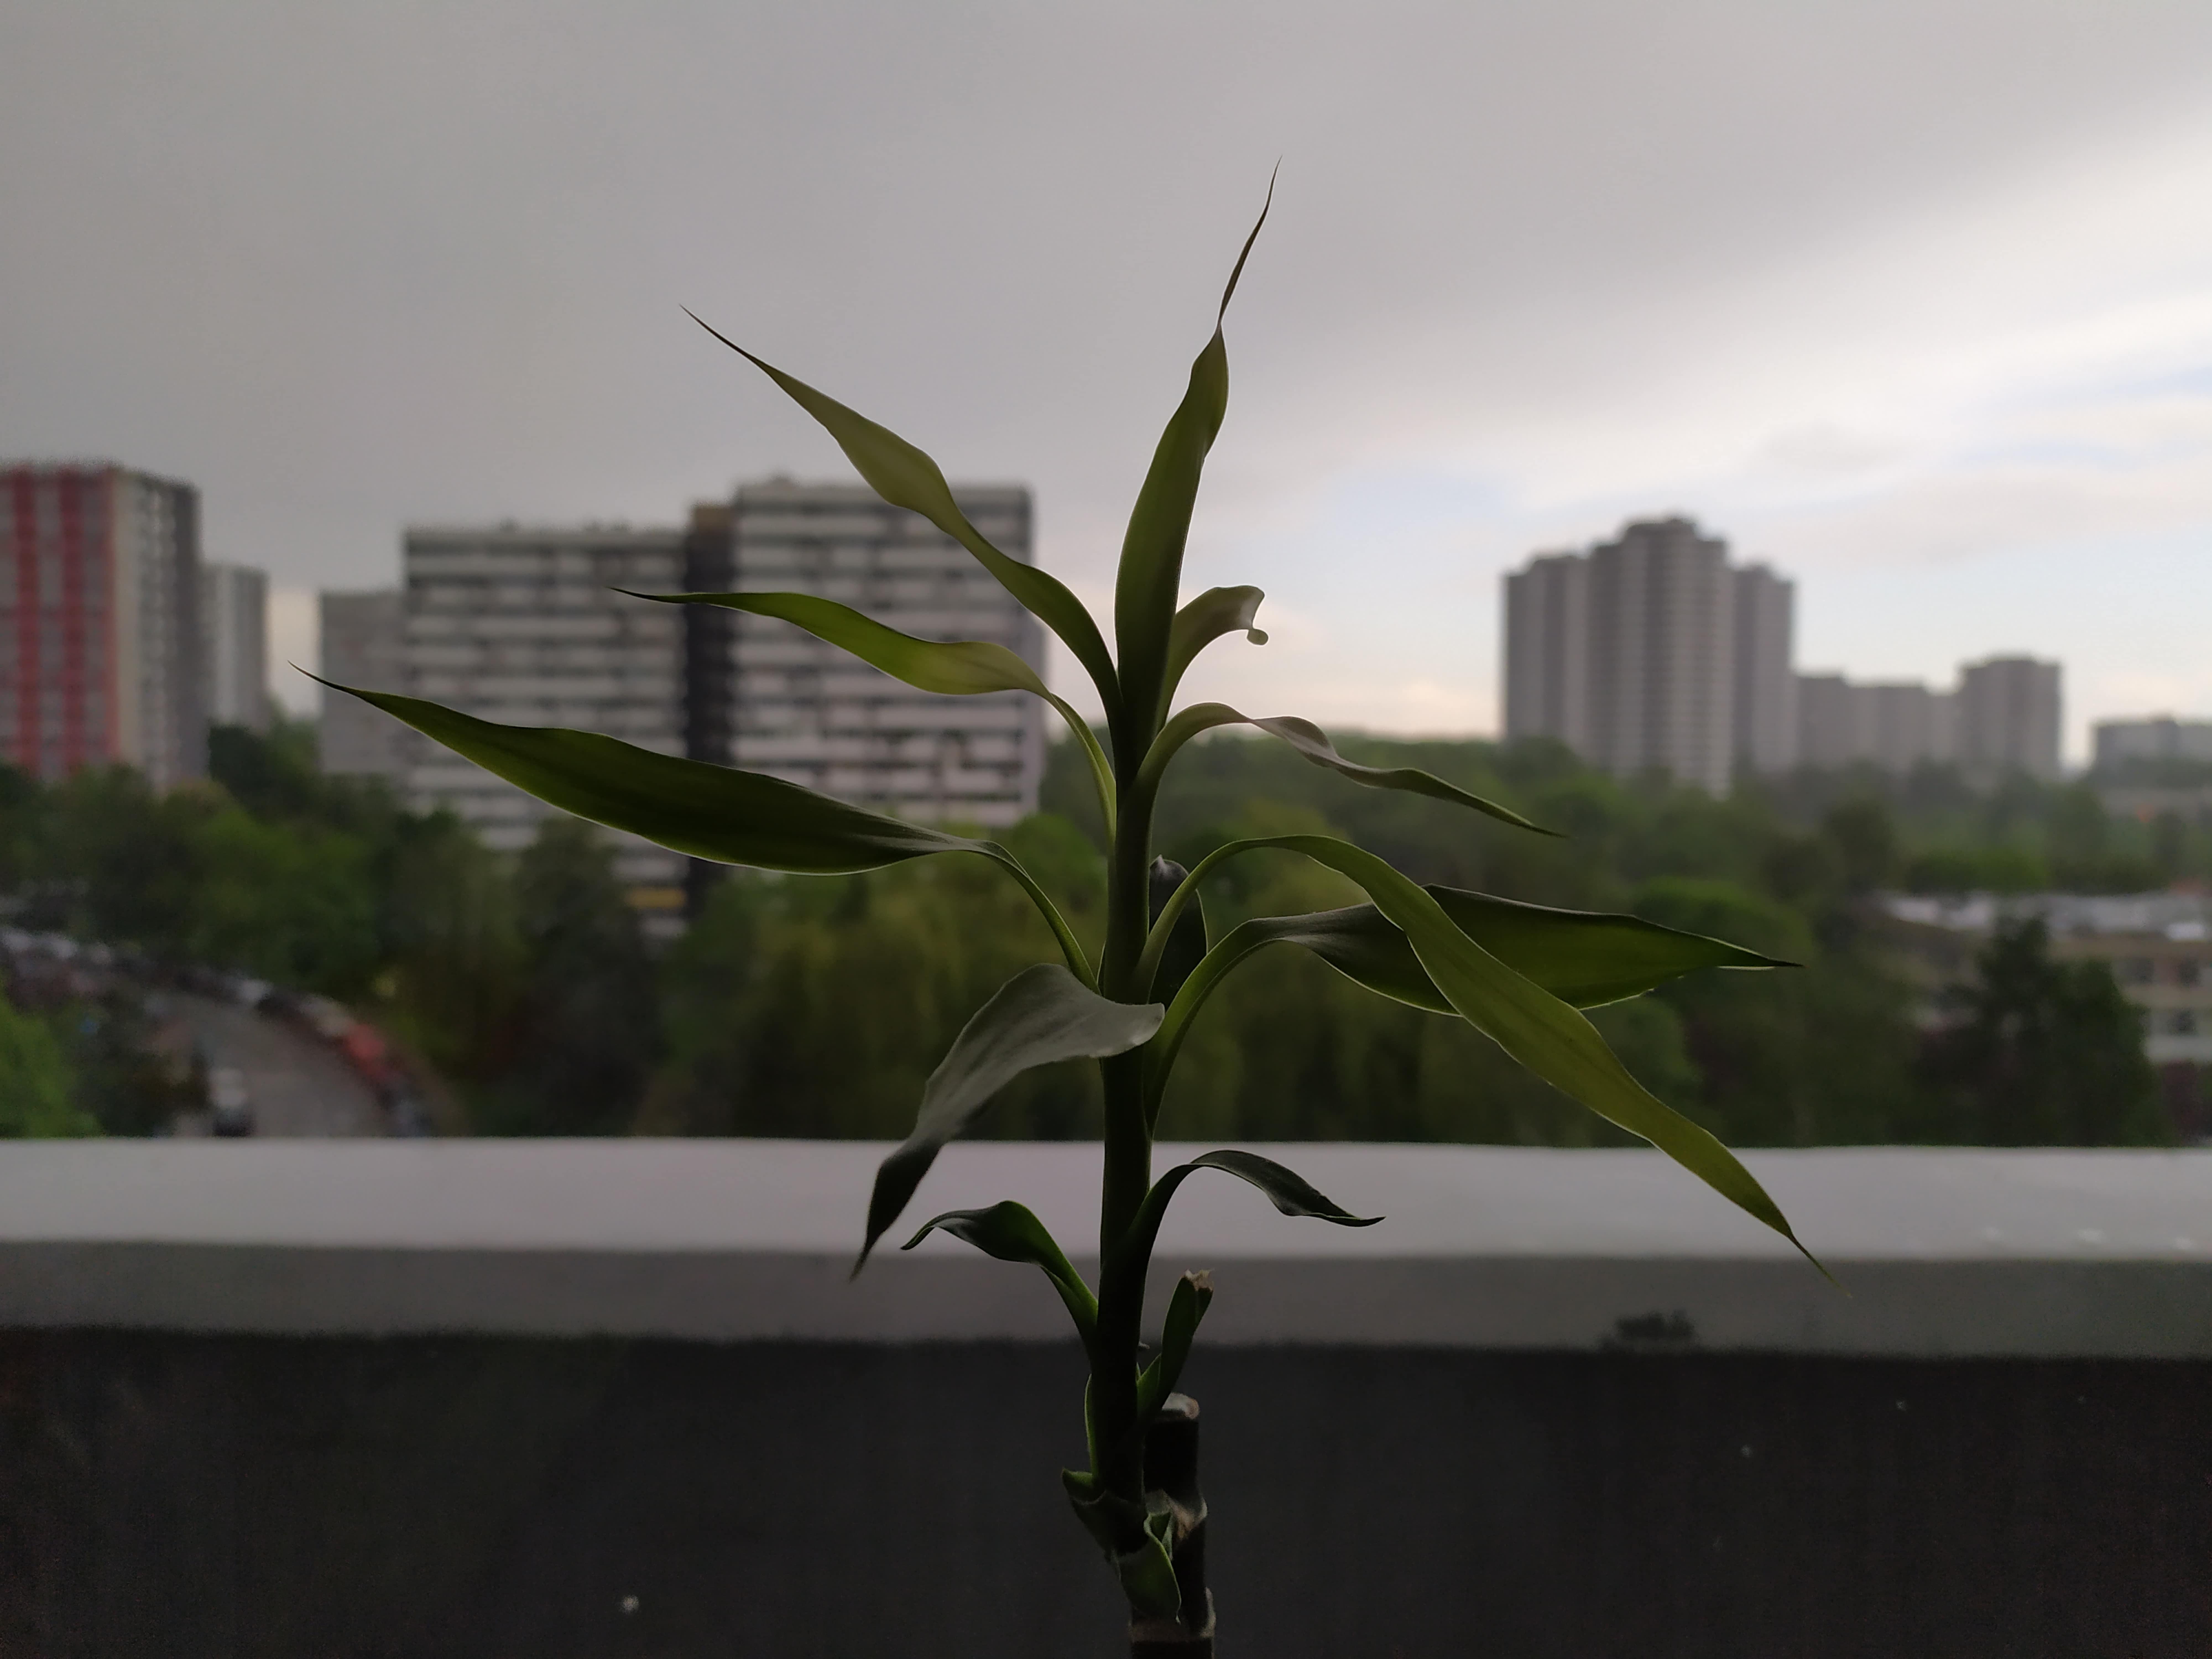 Zdjęcia makro - Redmi Note 7